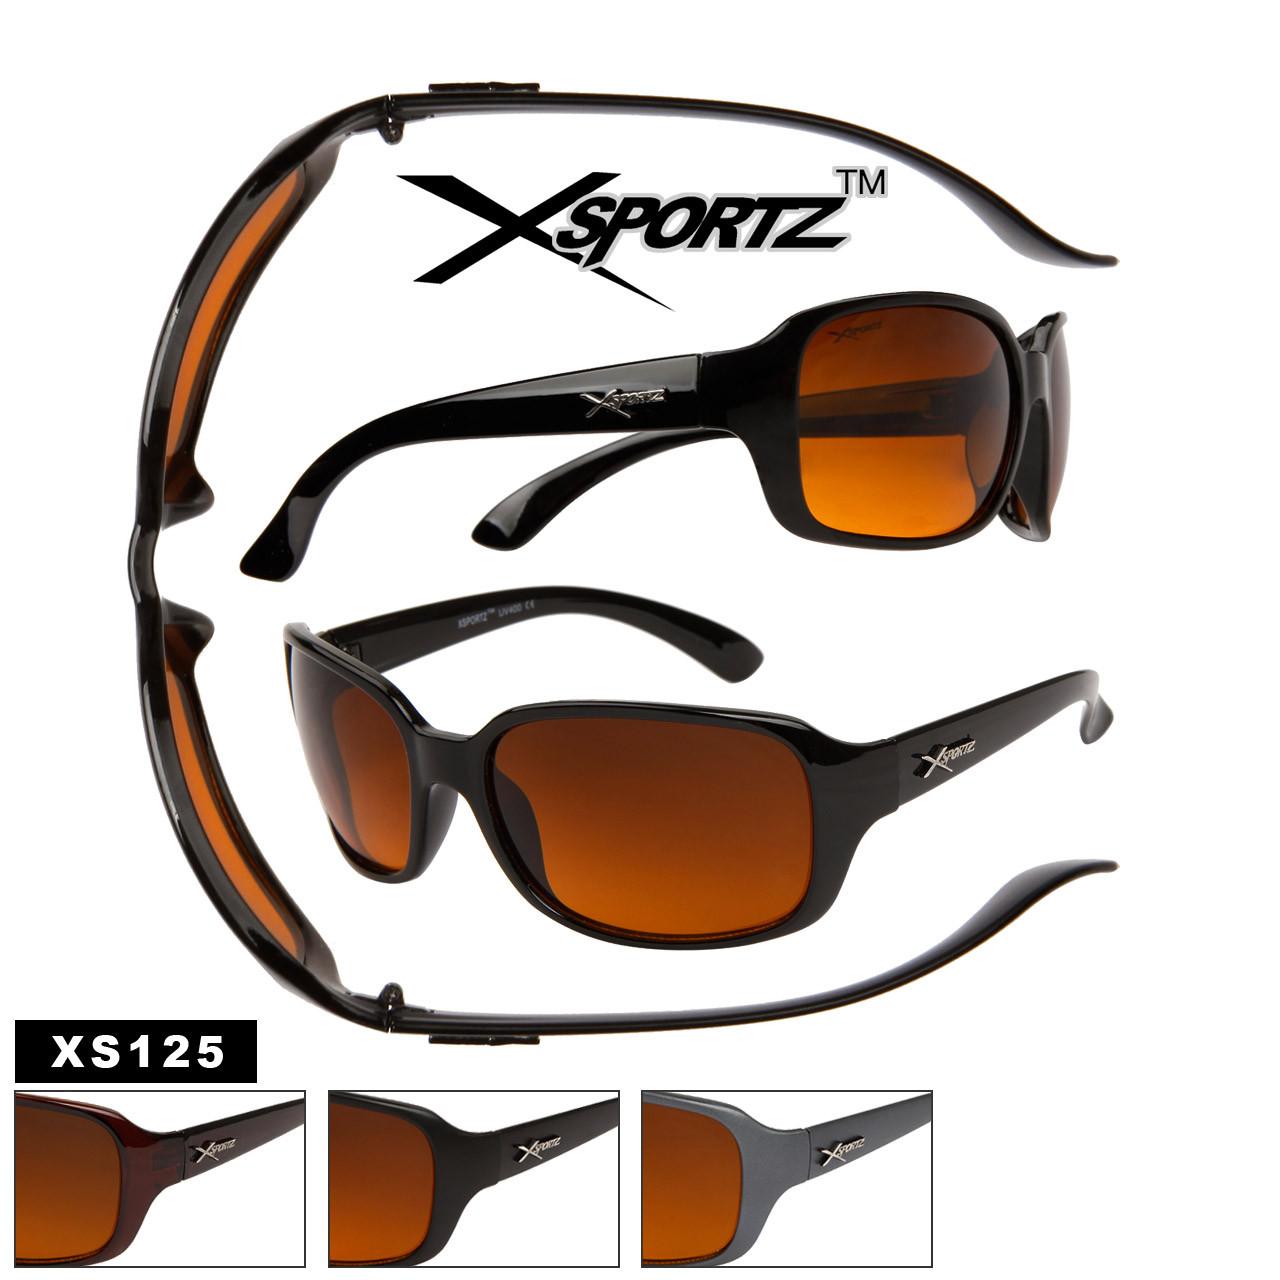 Blocks Blue Light Sunglasses XS125